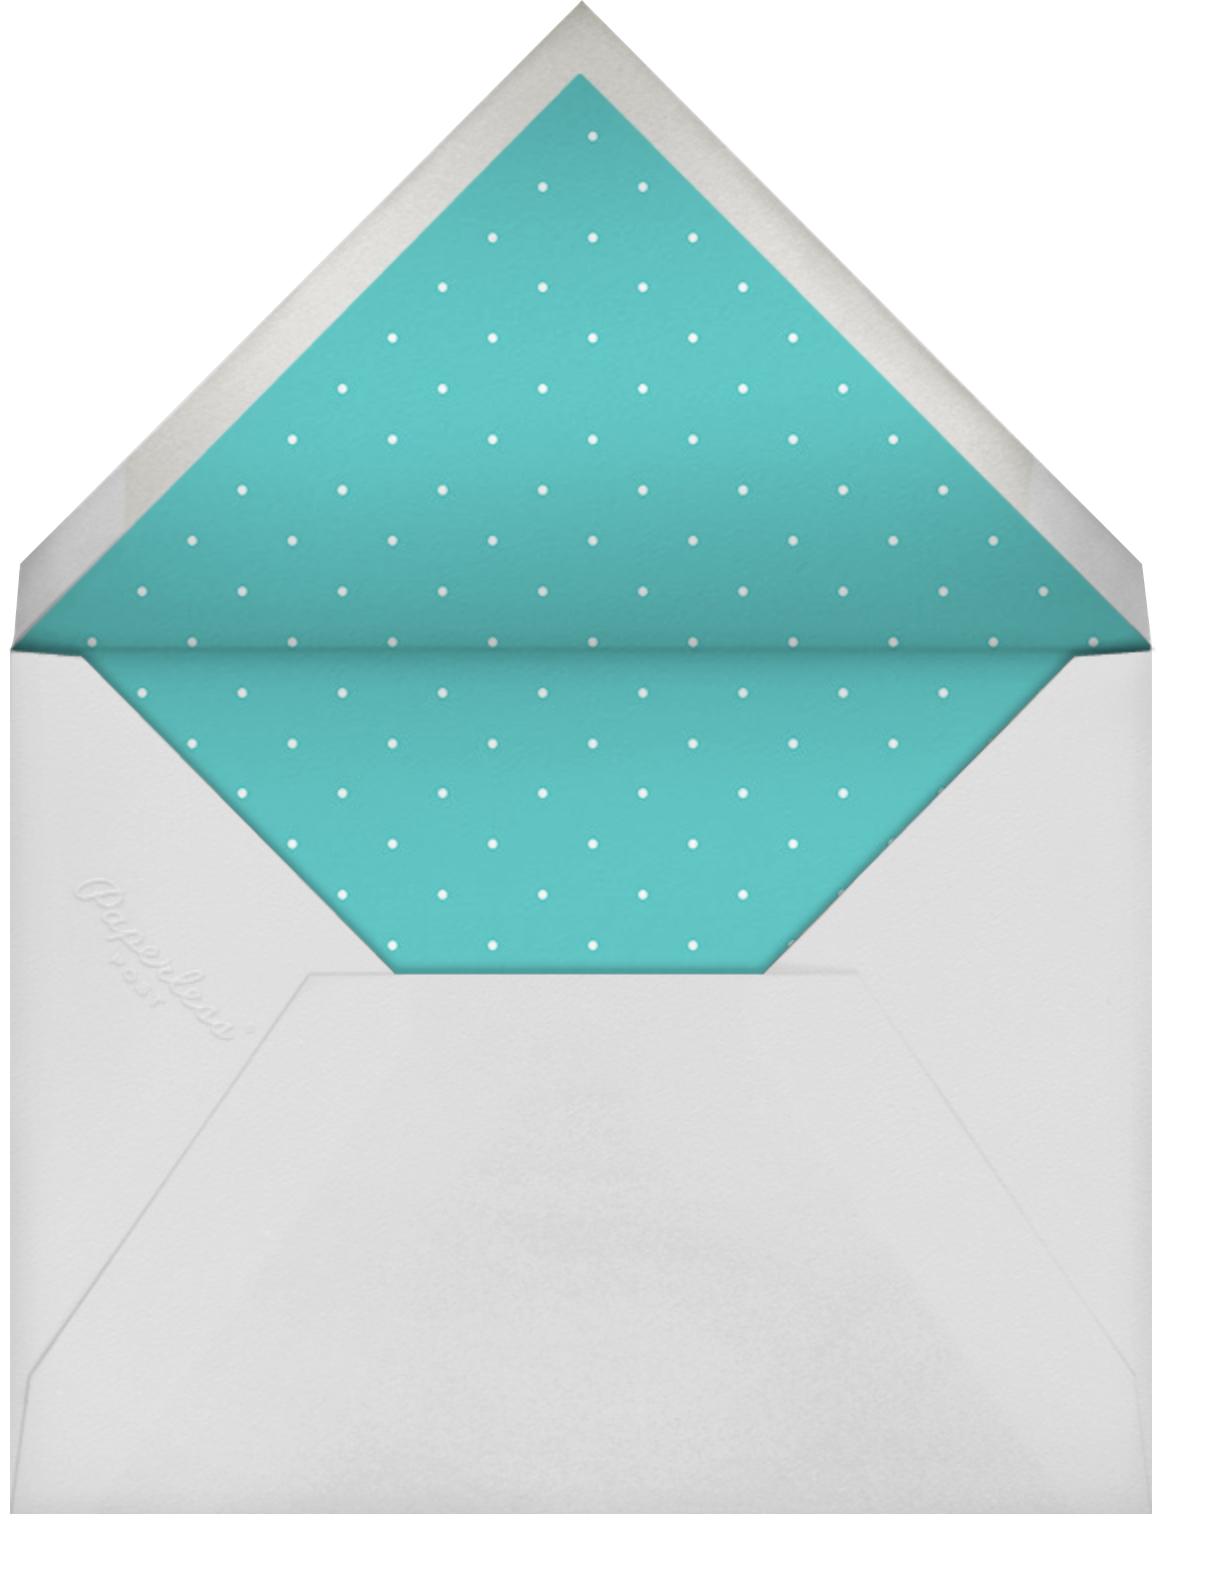 Hit the Lanes - Sri Lanka - Mr. Boddington's Studio - Adult birthday - envelope back